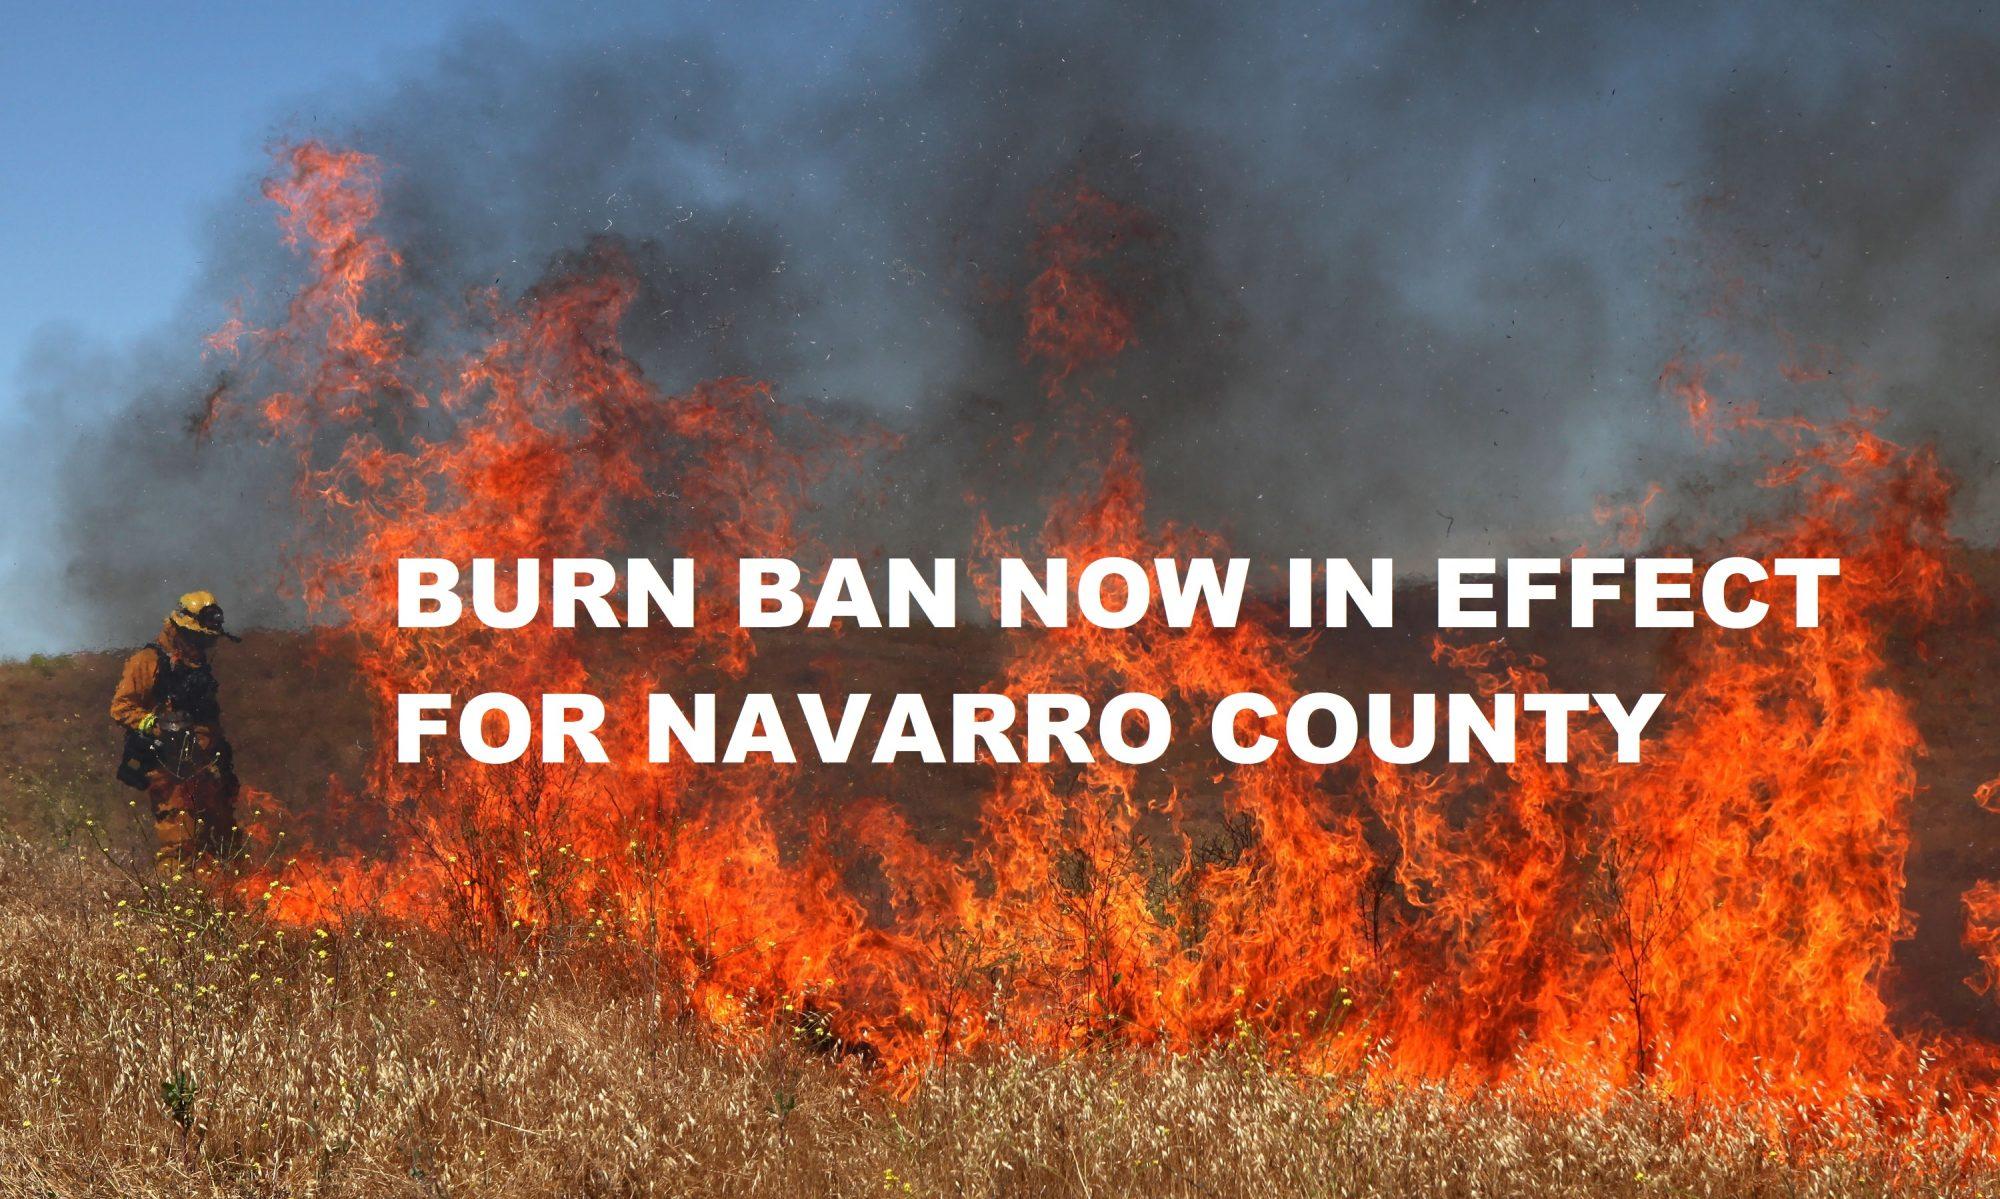 Navarro County OEM